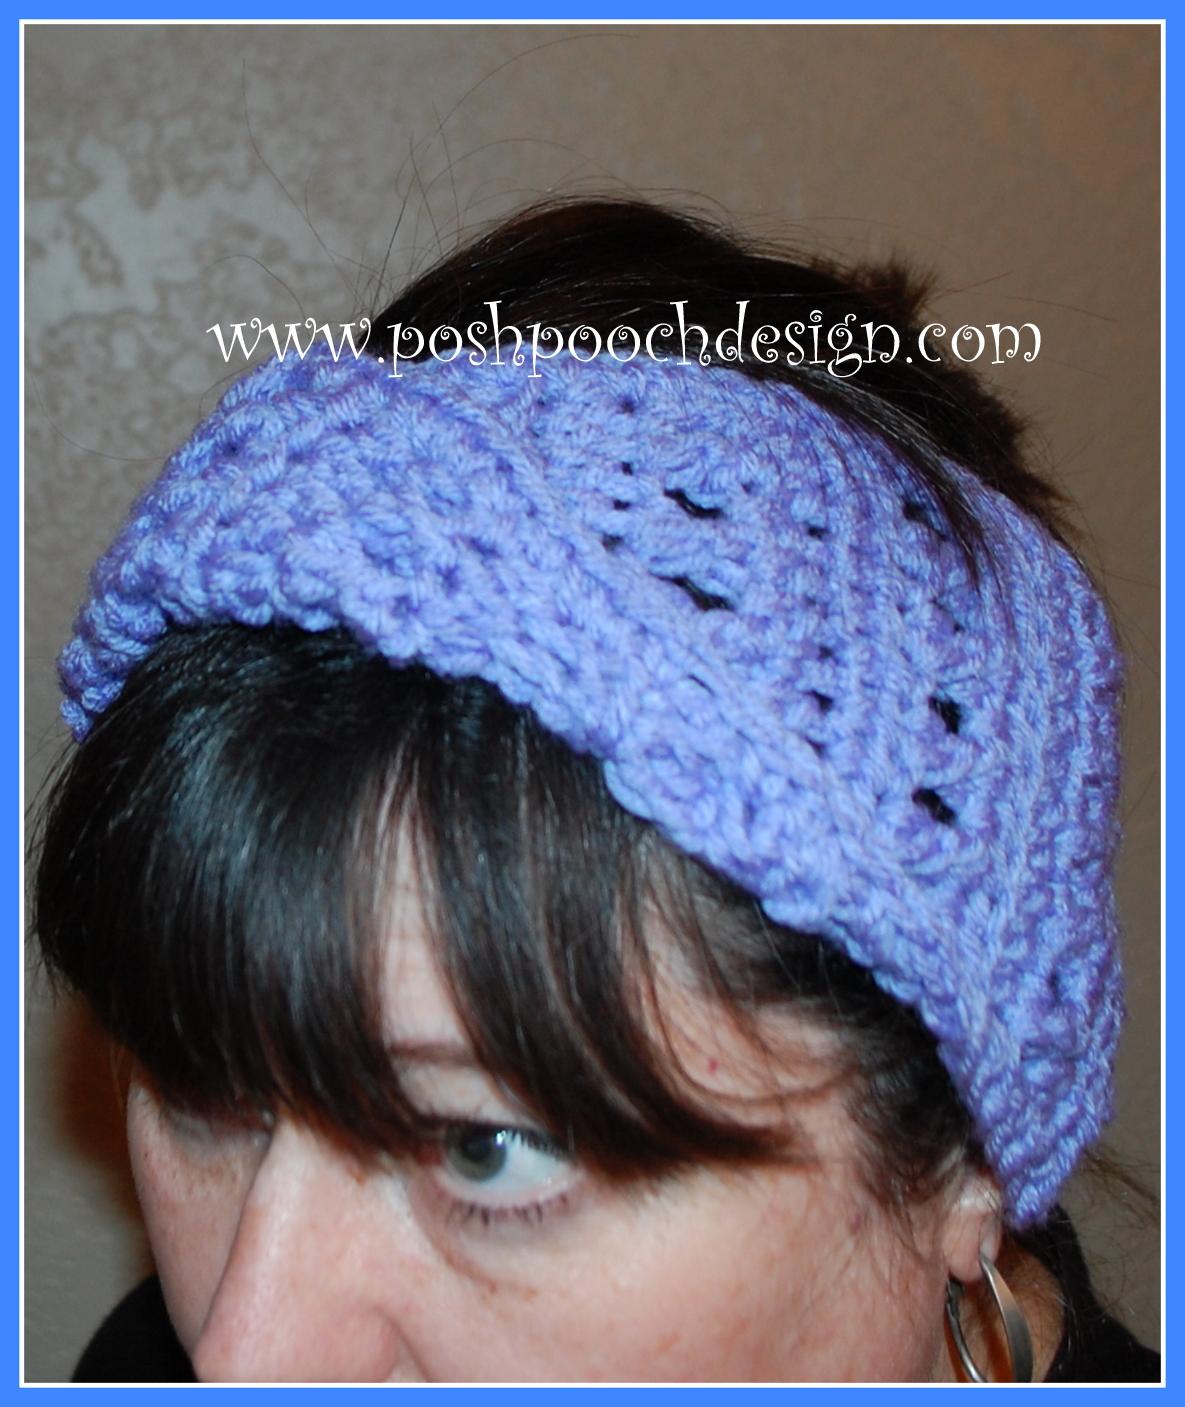 Free Knitting Pattern Twisted Headband : Posh Pooch Designs Dog Clothes: Twisted Headband Crochet ...